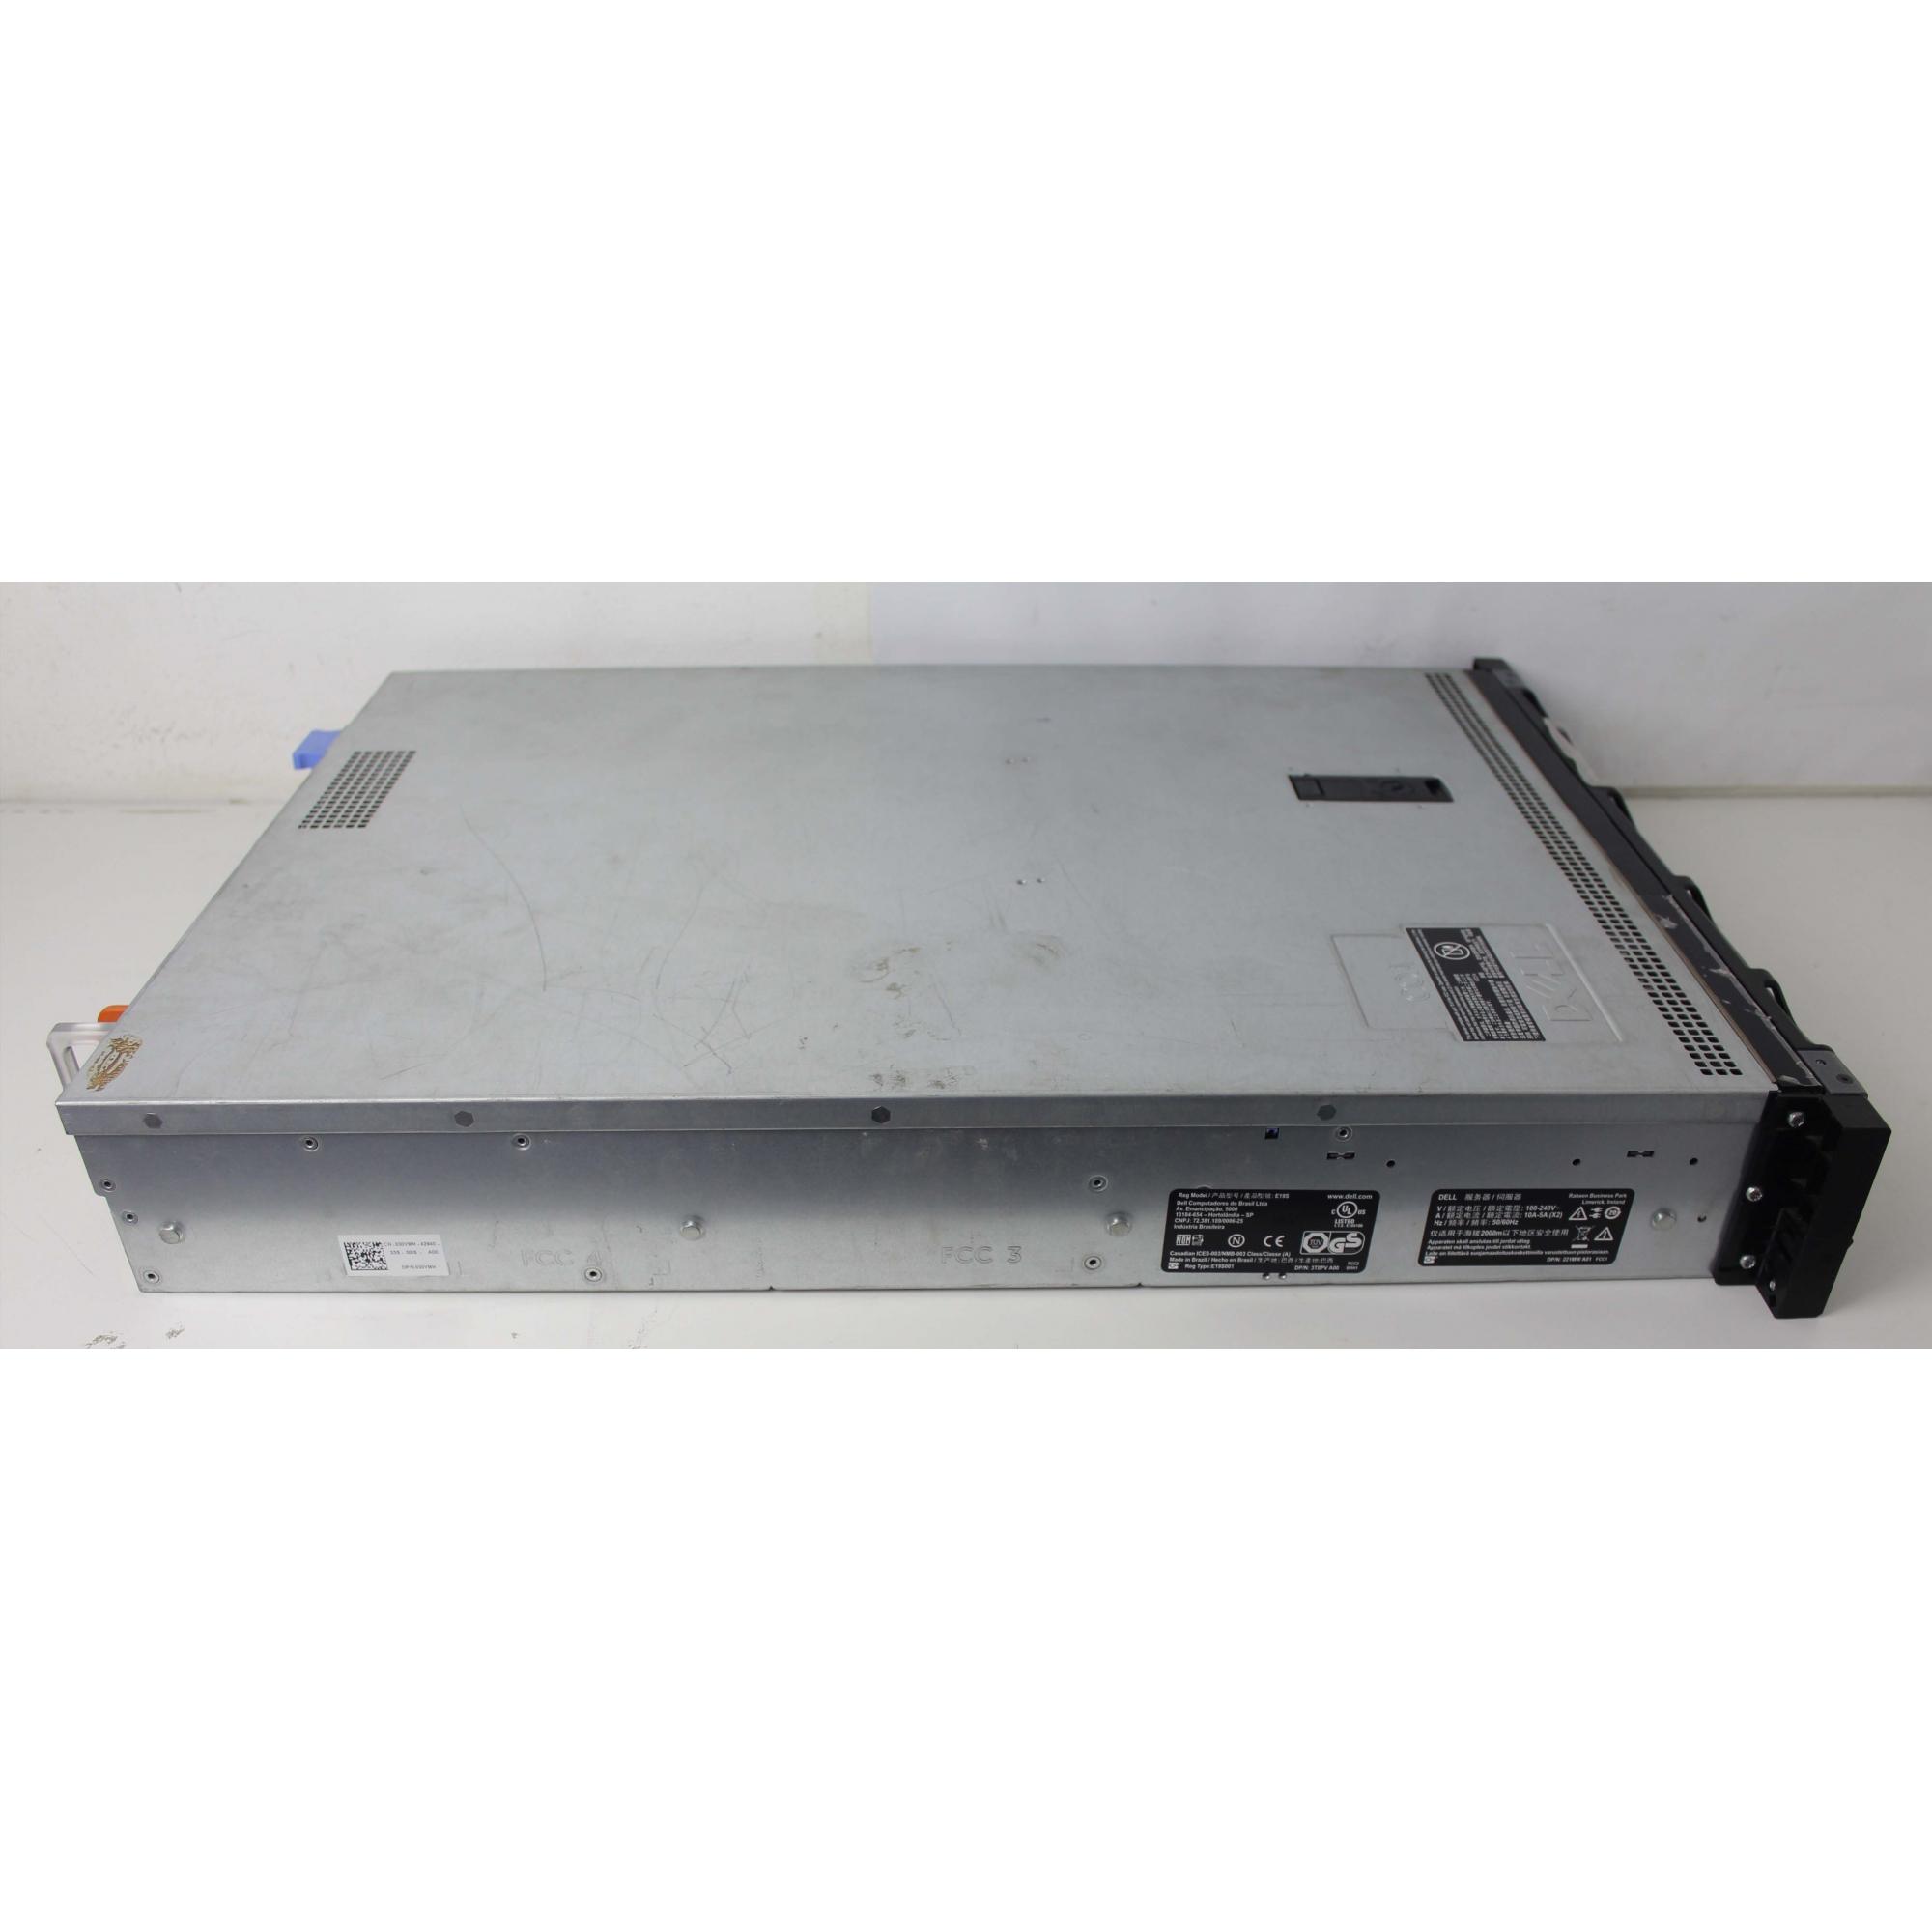 SERVIDOR DELL POWEREDGE R520 2X INTEL XEON E5-2520 1.9GHZ 32GB HD-1TB (NÃO ENVIAMOS)